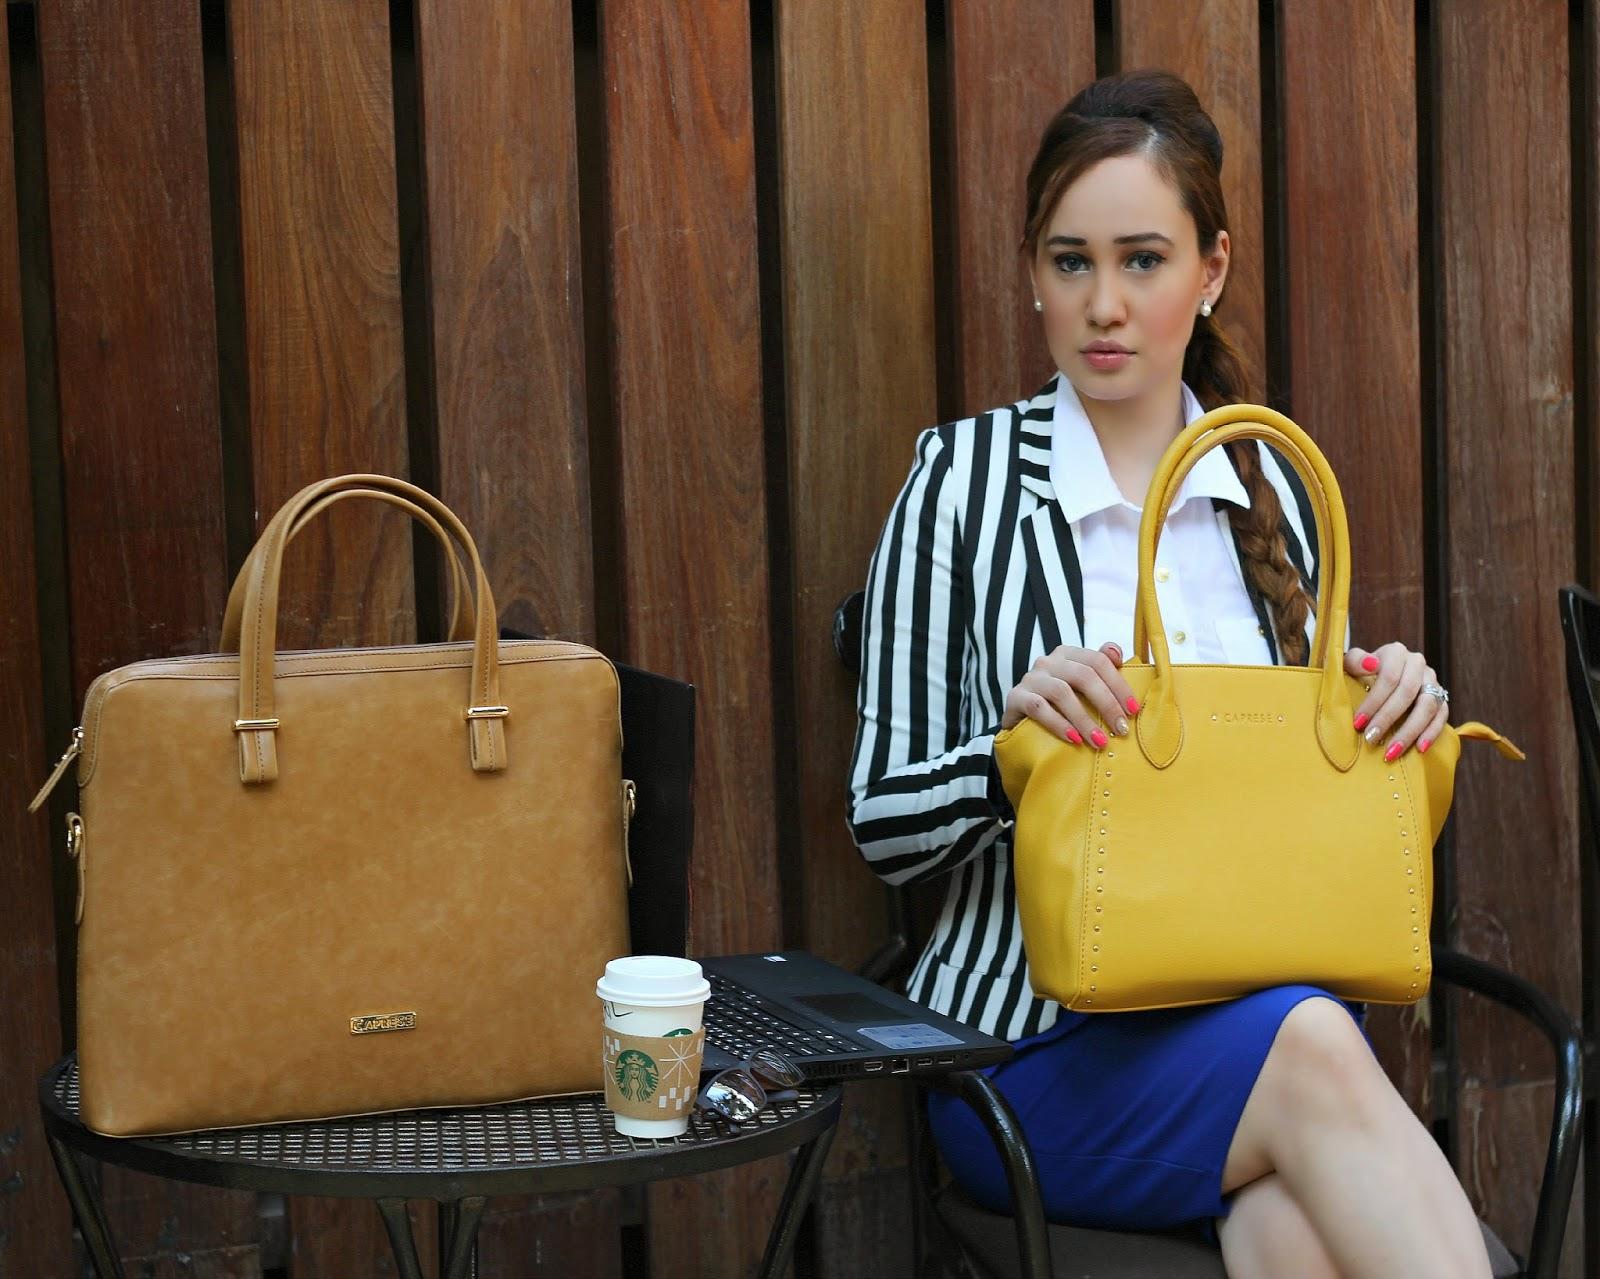 Caprese handbags, Striped Blazer, White Skirt, Blue Pencil Skirt